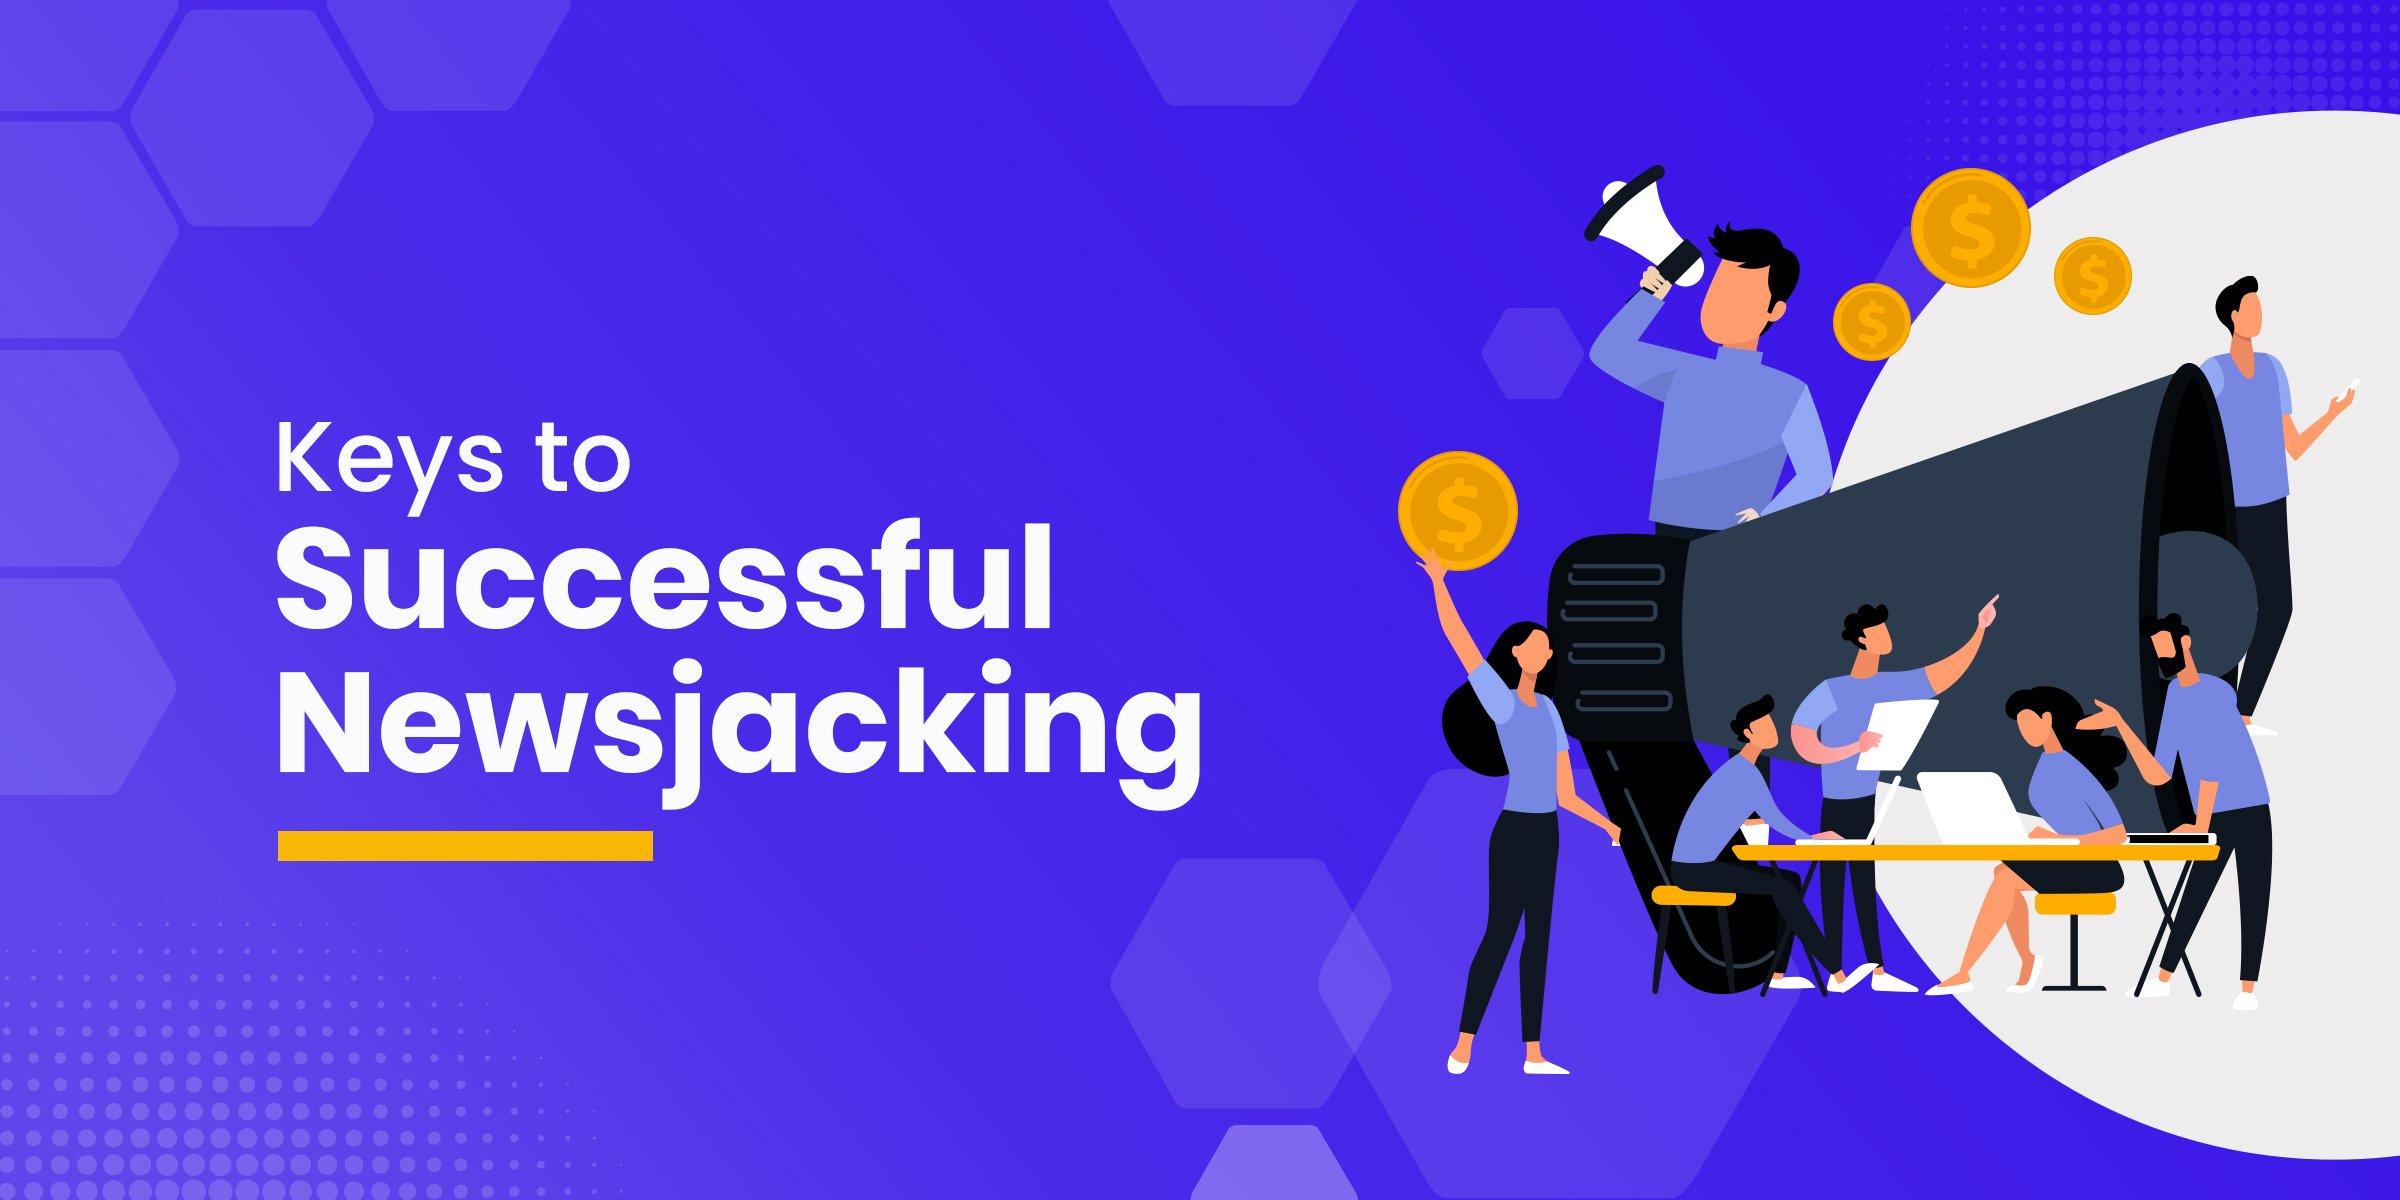 Keys to Successful Newsjacking